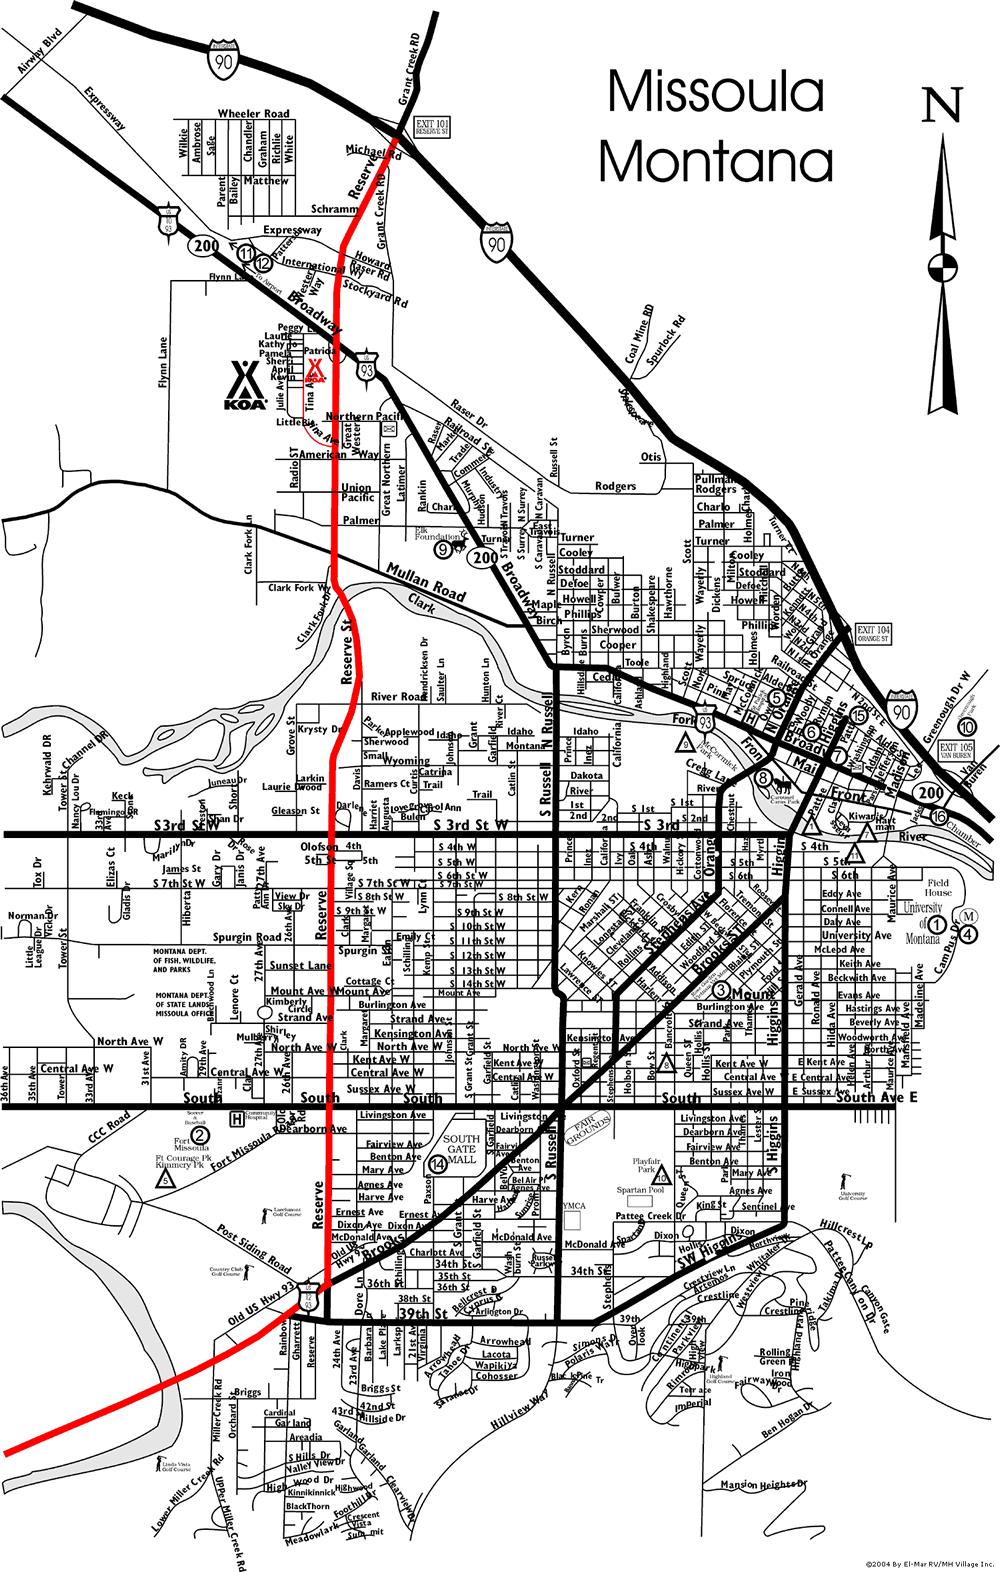 Missoula Montana City Map Missoula MOntana Mappery - City map of montana